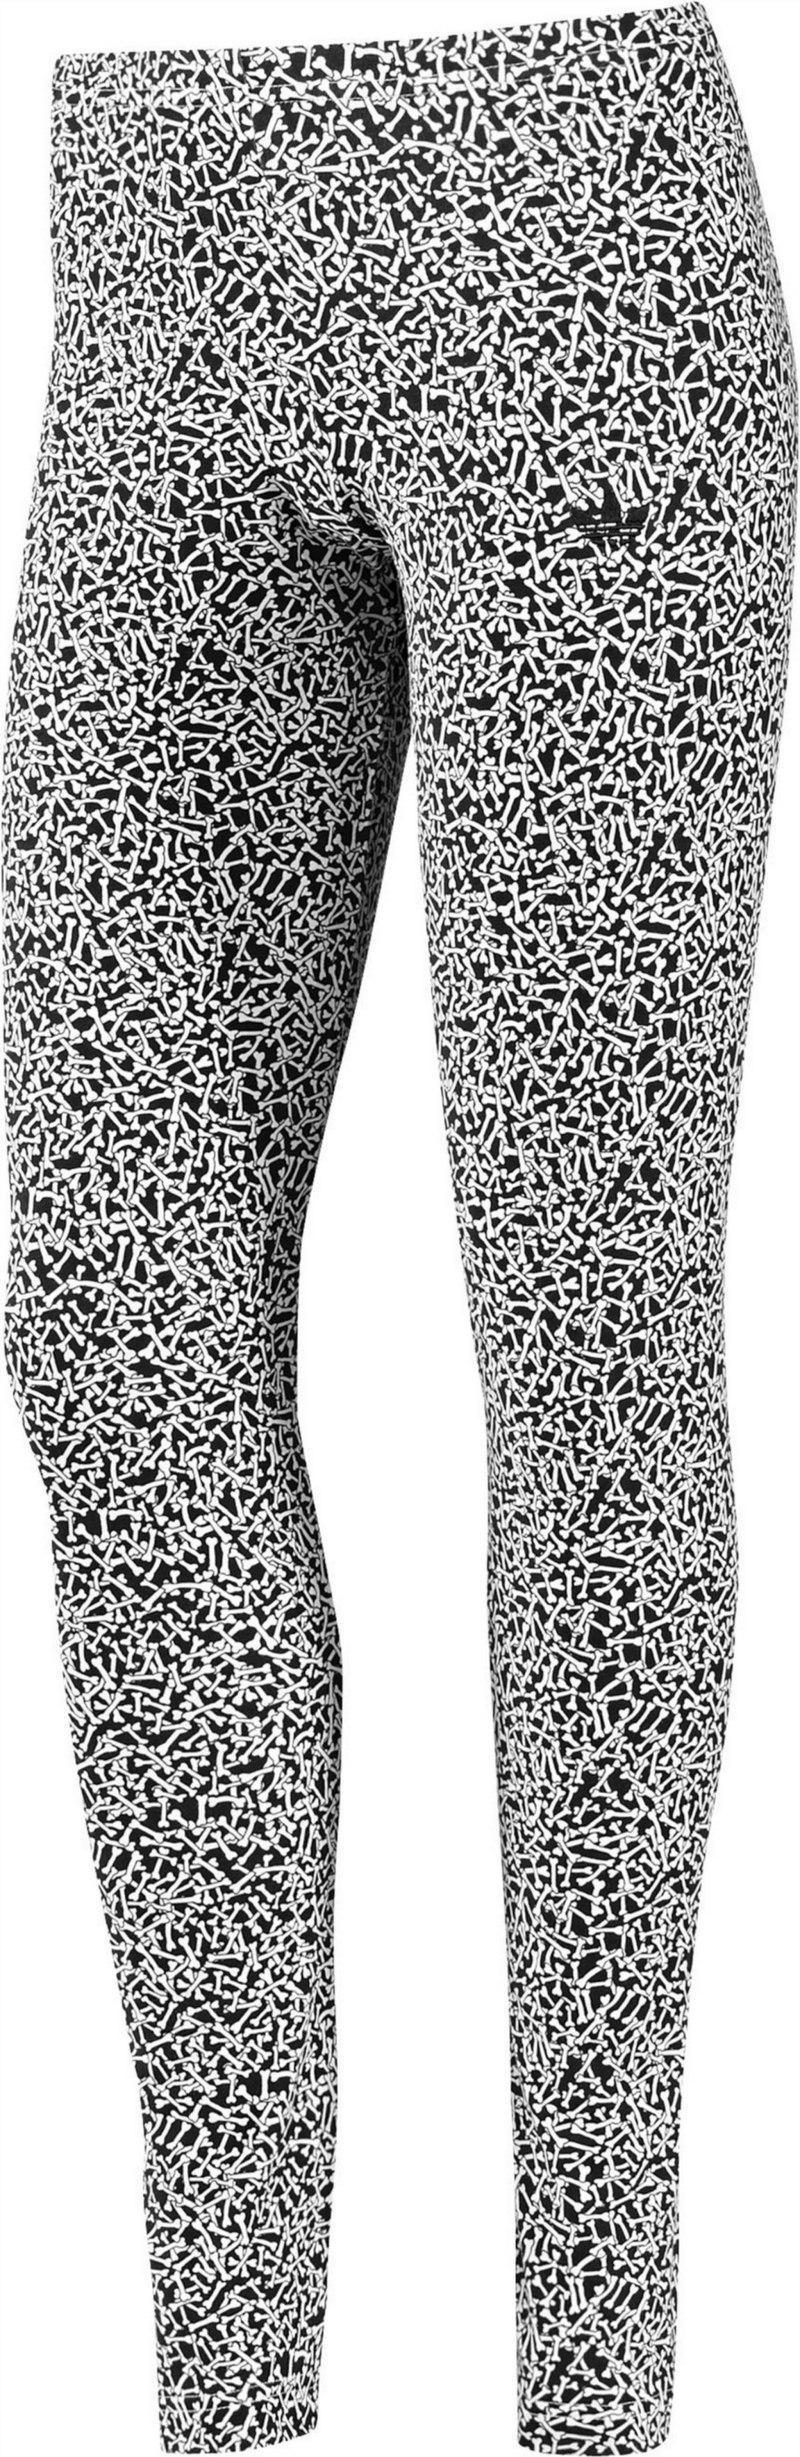 legginsy Adidas we wzorki - kolekcja wiosenno-letnia